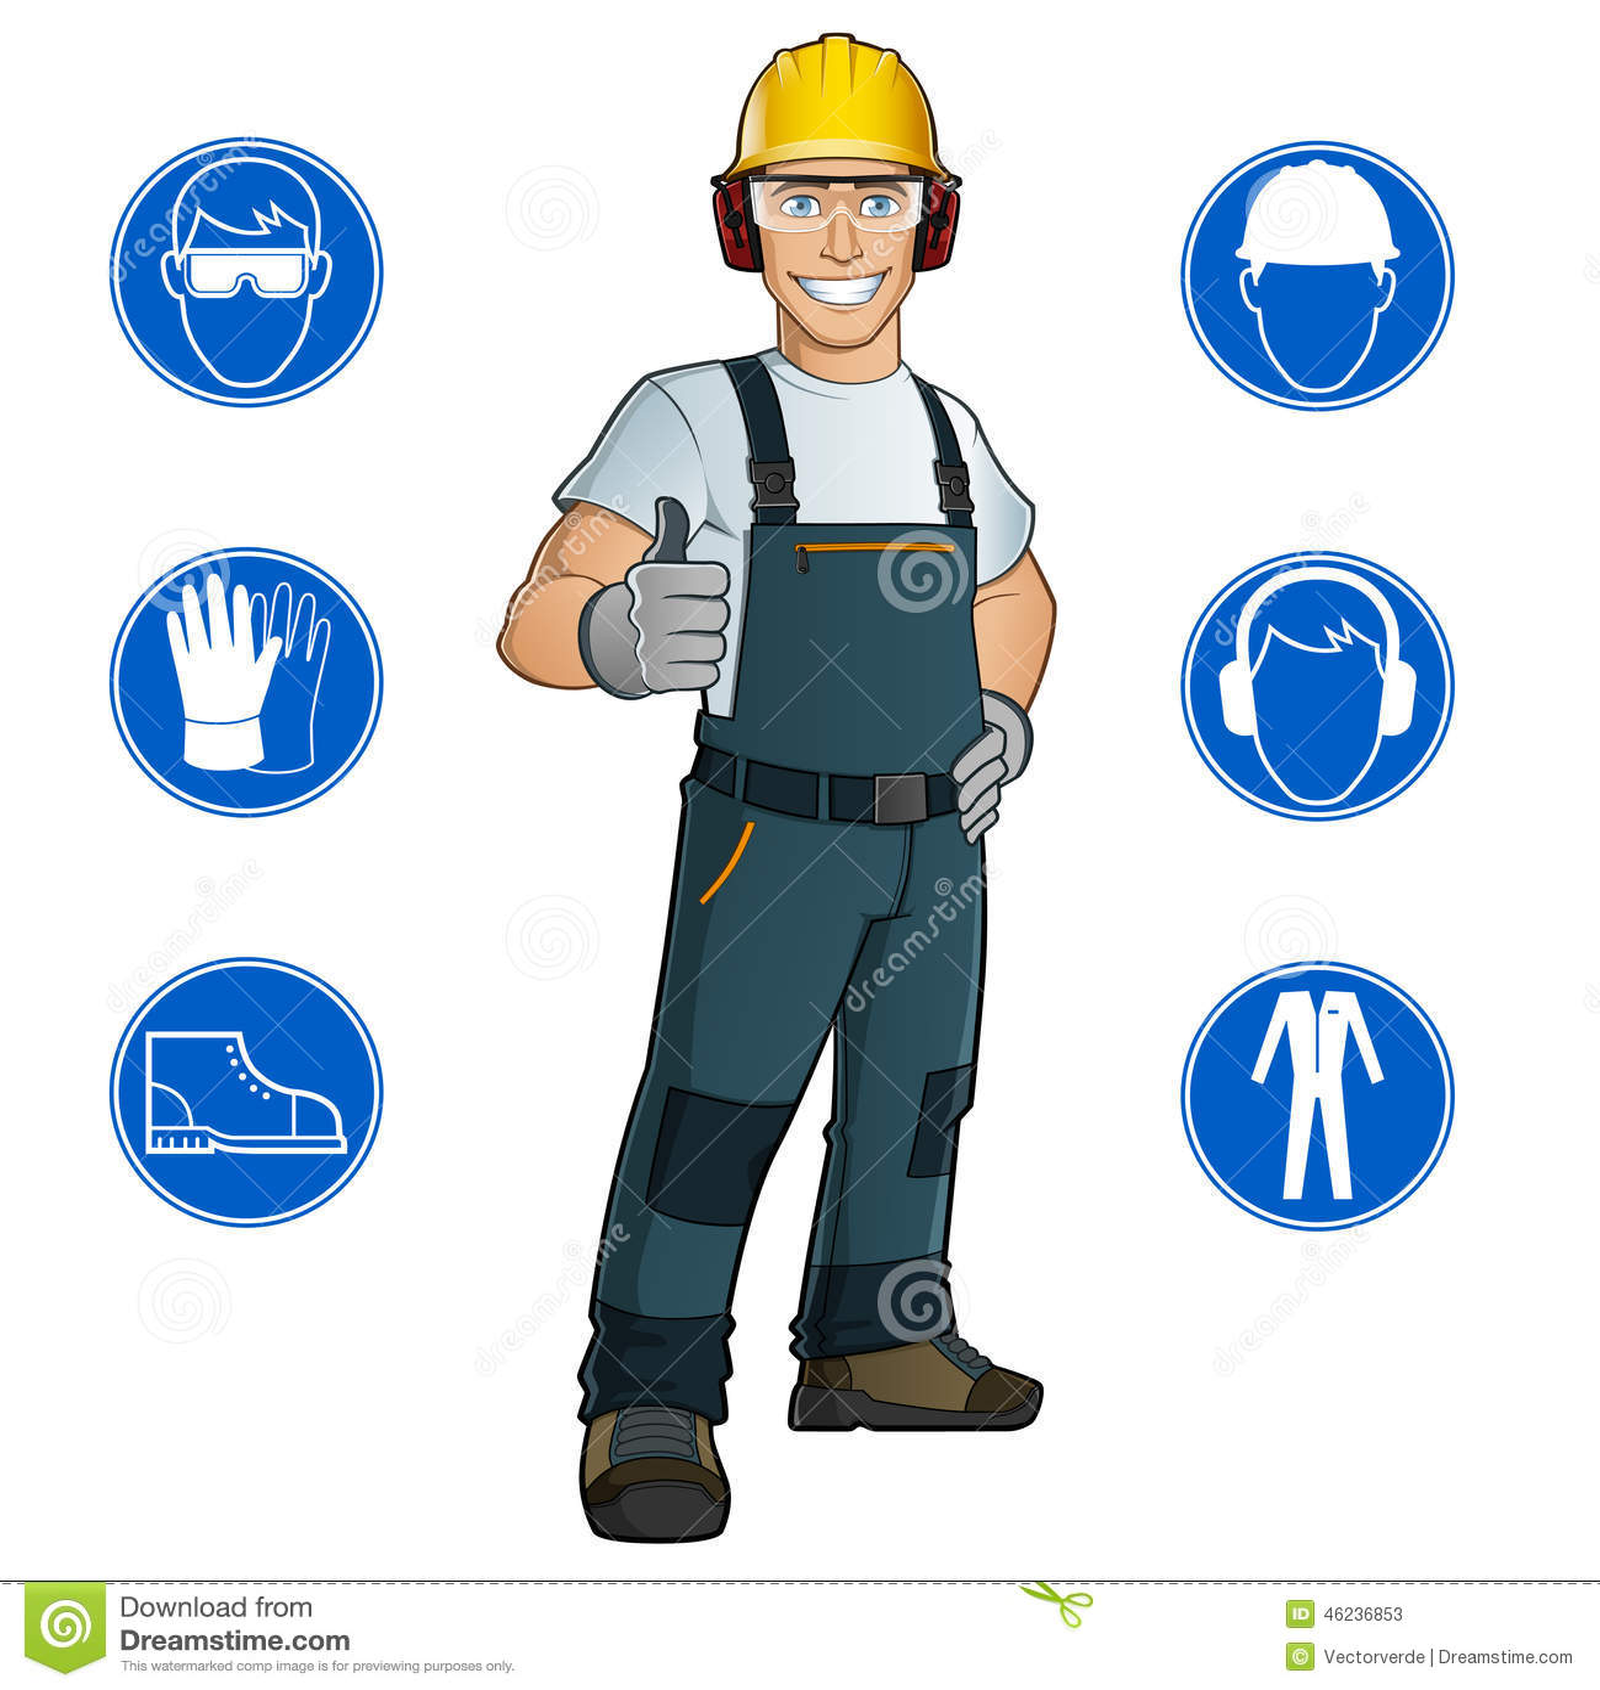 Best Work Gloves >> Man Dressed In Work Clothes Stock Vector - Illustration of equipment, helmet: 46236853